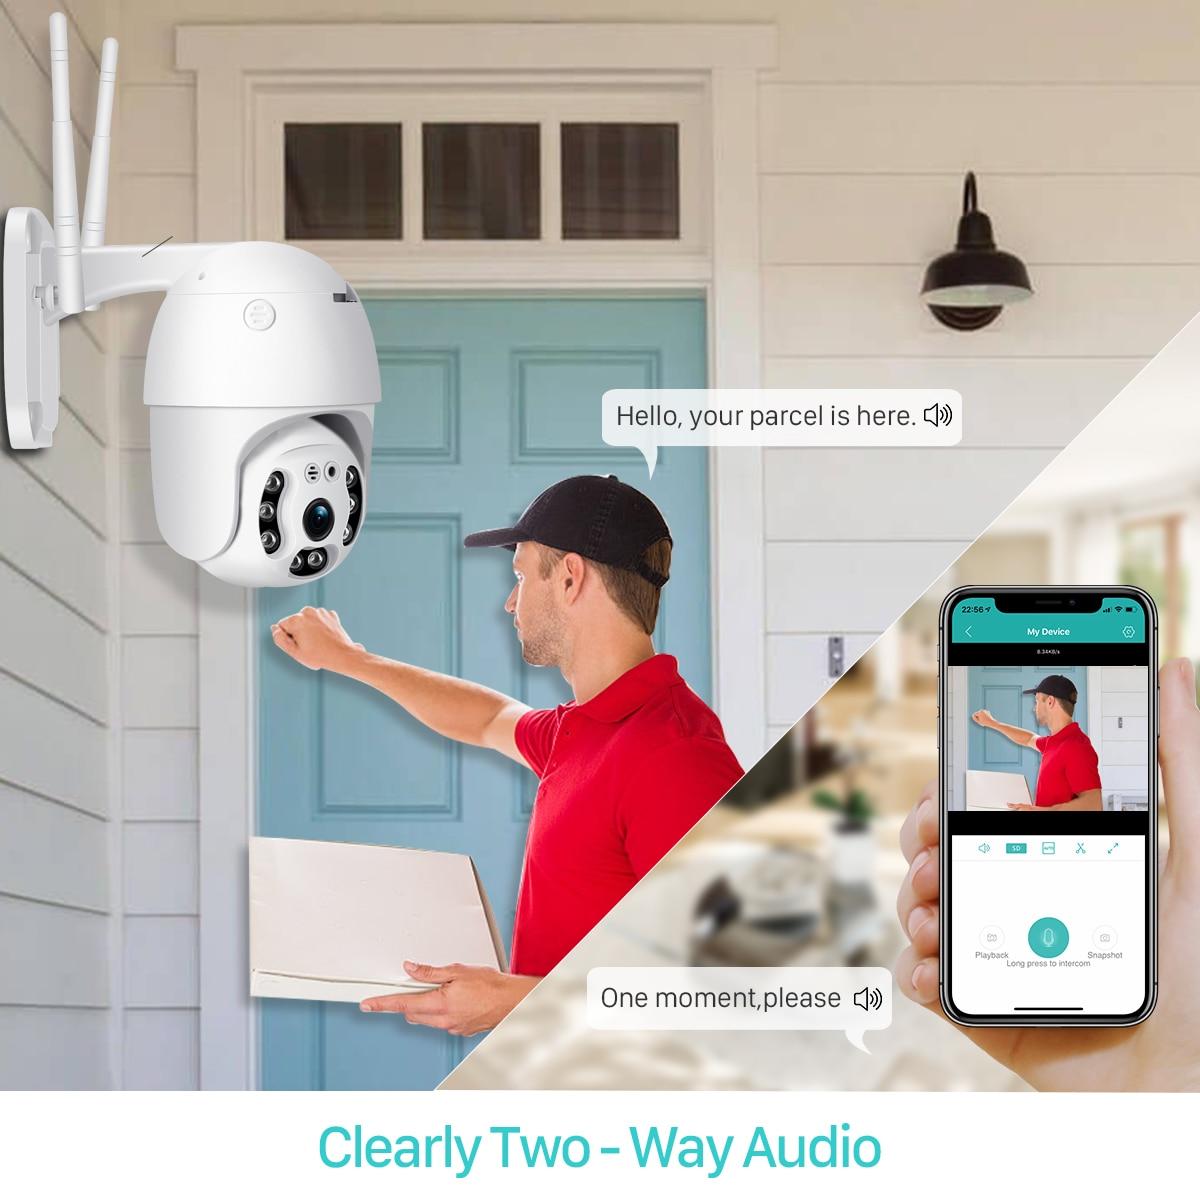 Hd81f00422edd405ebeda0f6e49281098E BESDER 1080P Outdoor Speed Dome Wifi Camera 2MP H.265 Audio PTZ Wireless Camera Cloud-SD Slot ONVIF Home Surveillance IP Camera